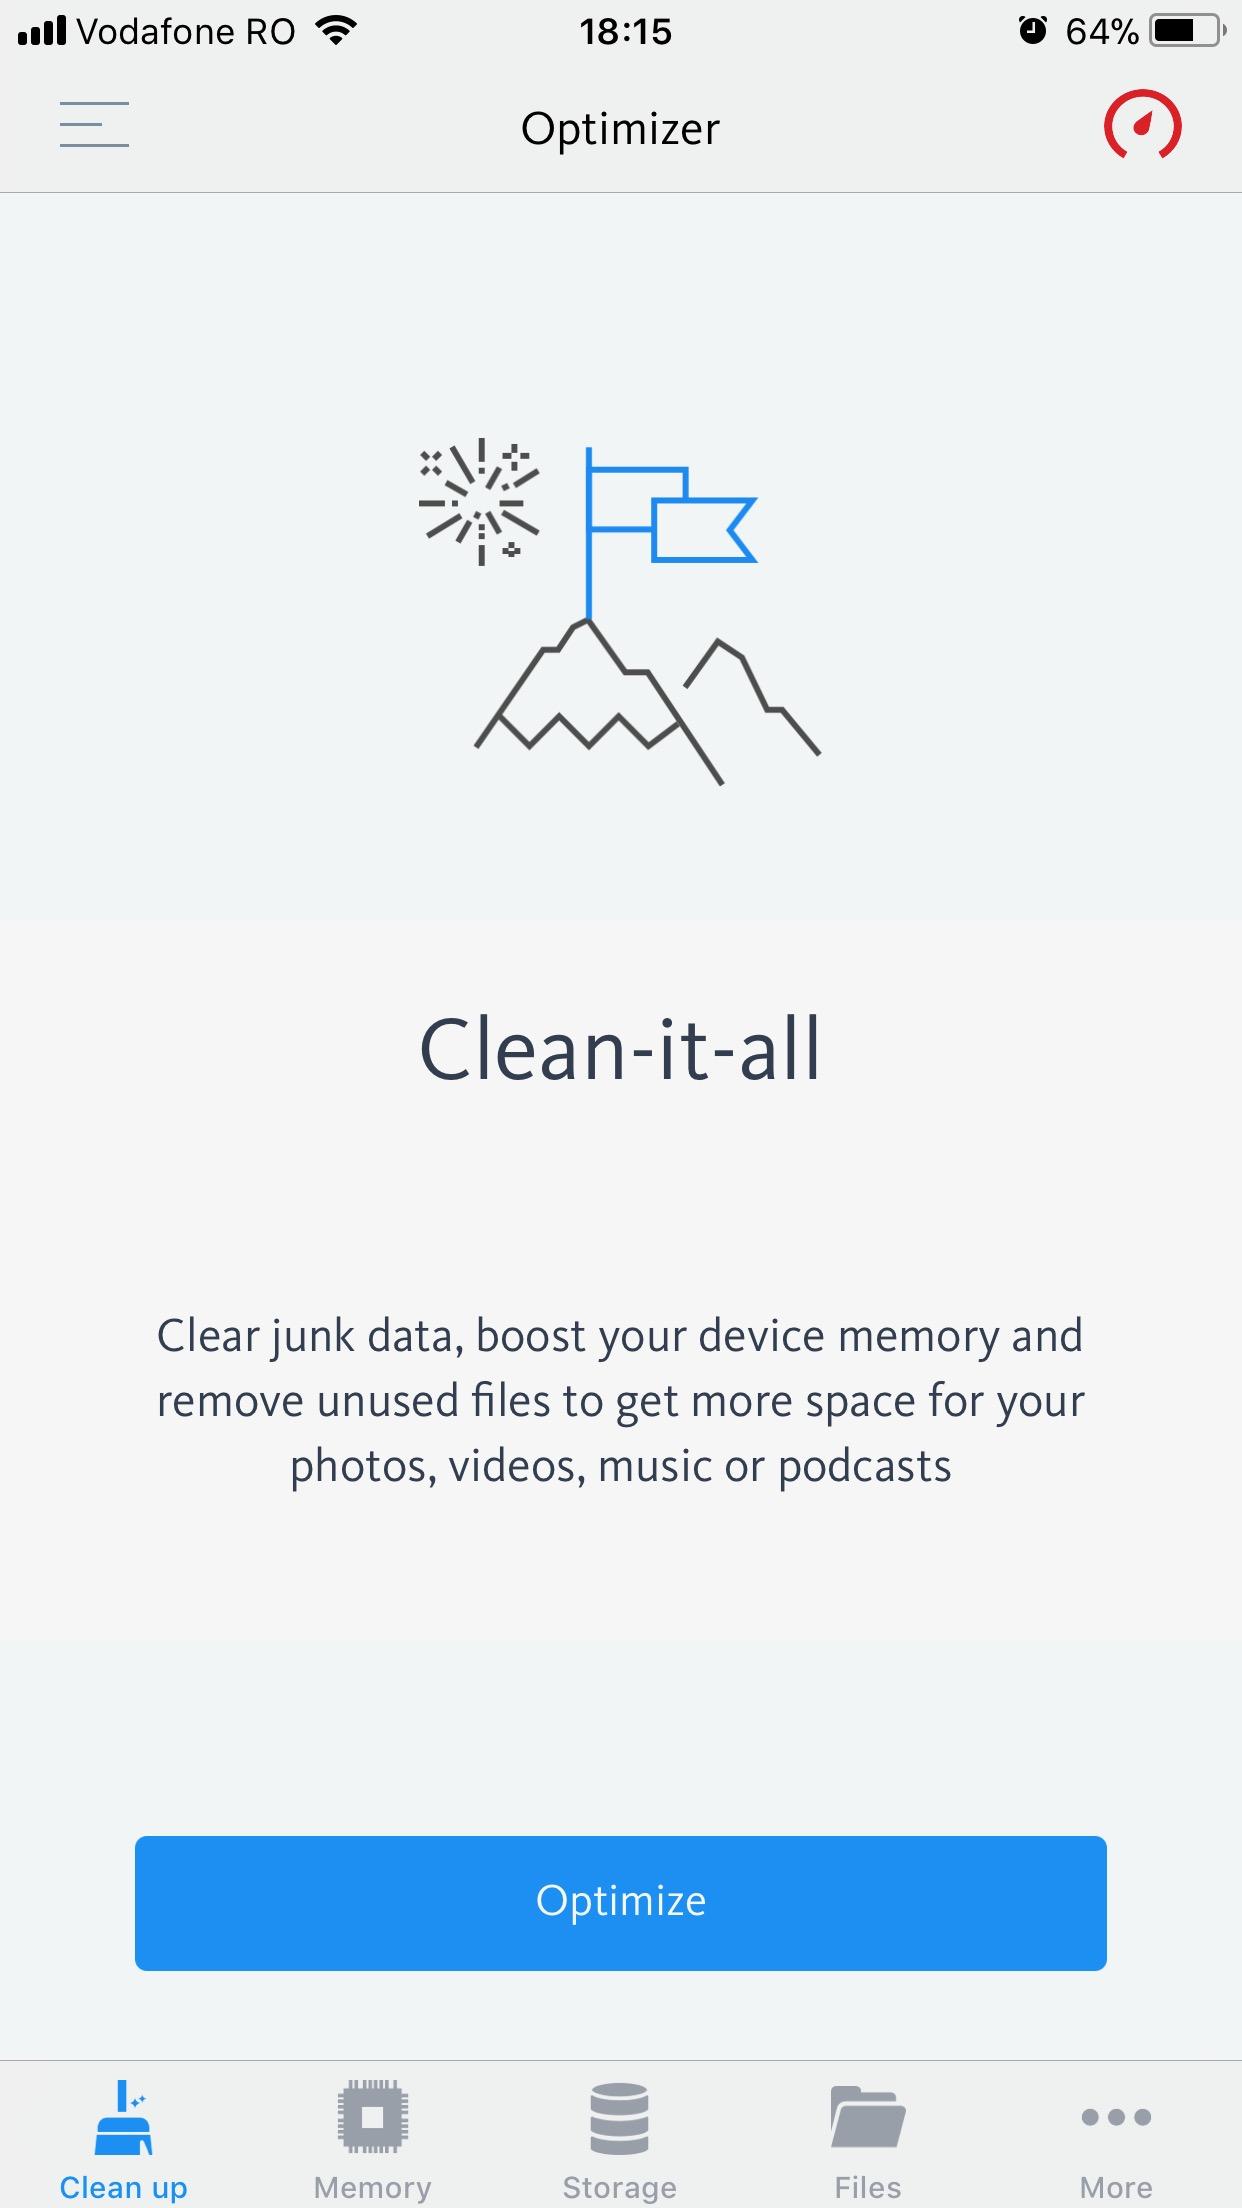 Enhance your iOS device with Avira Optimizer - Avira Blog